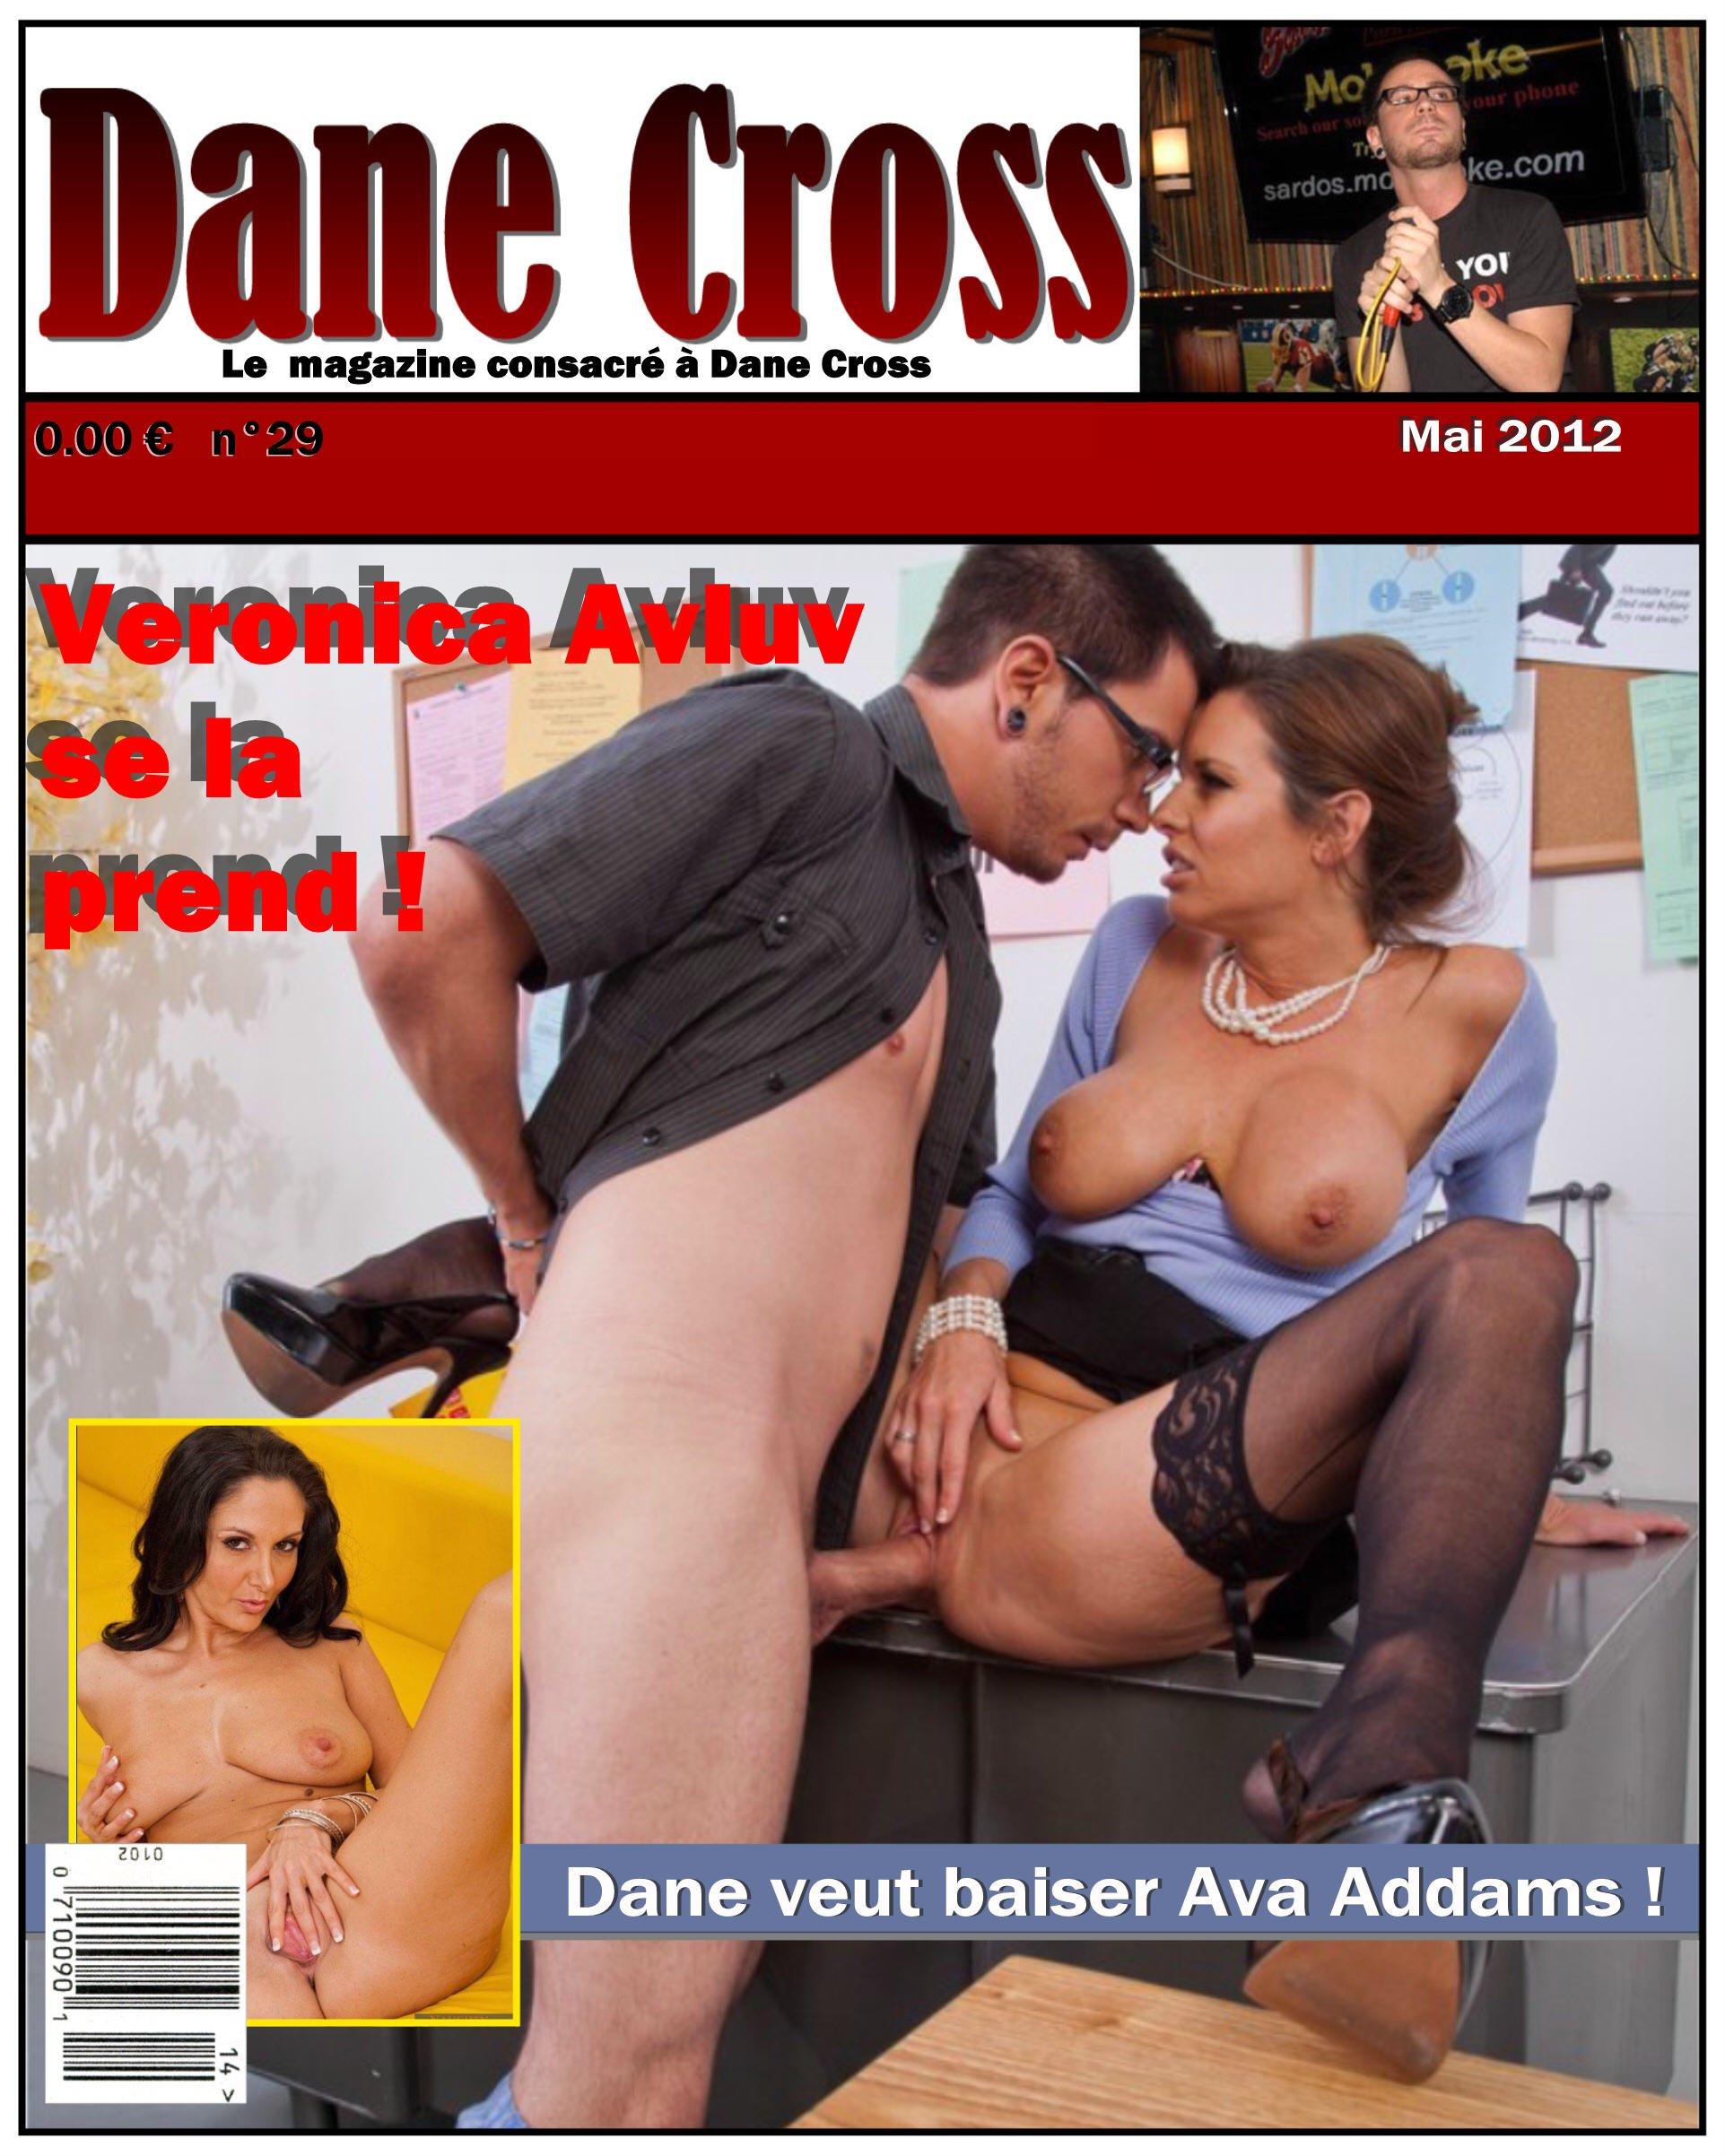 Wife, single Dane cross dick three-time Golden